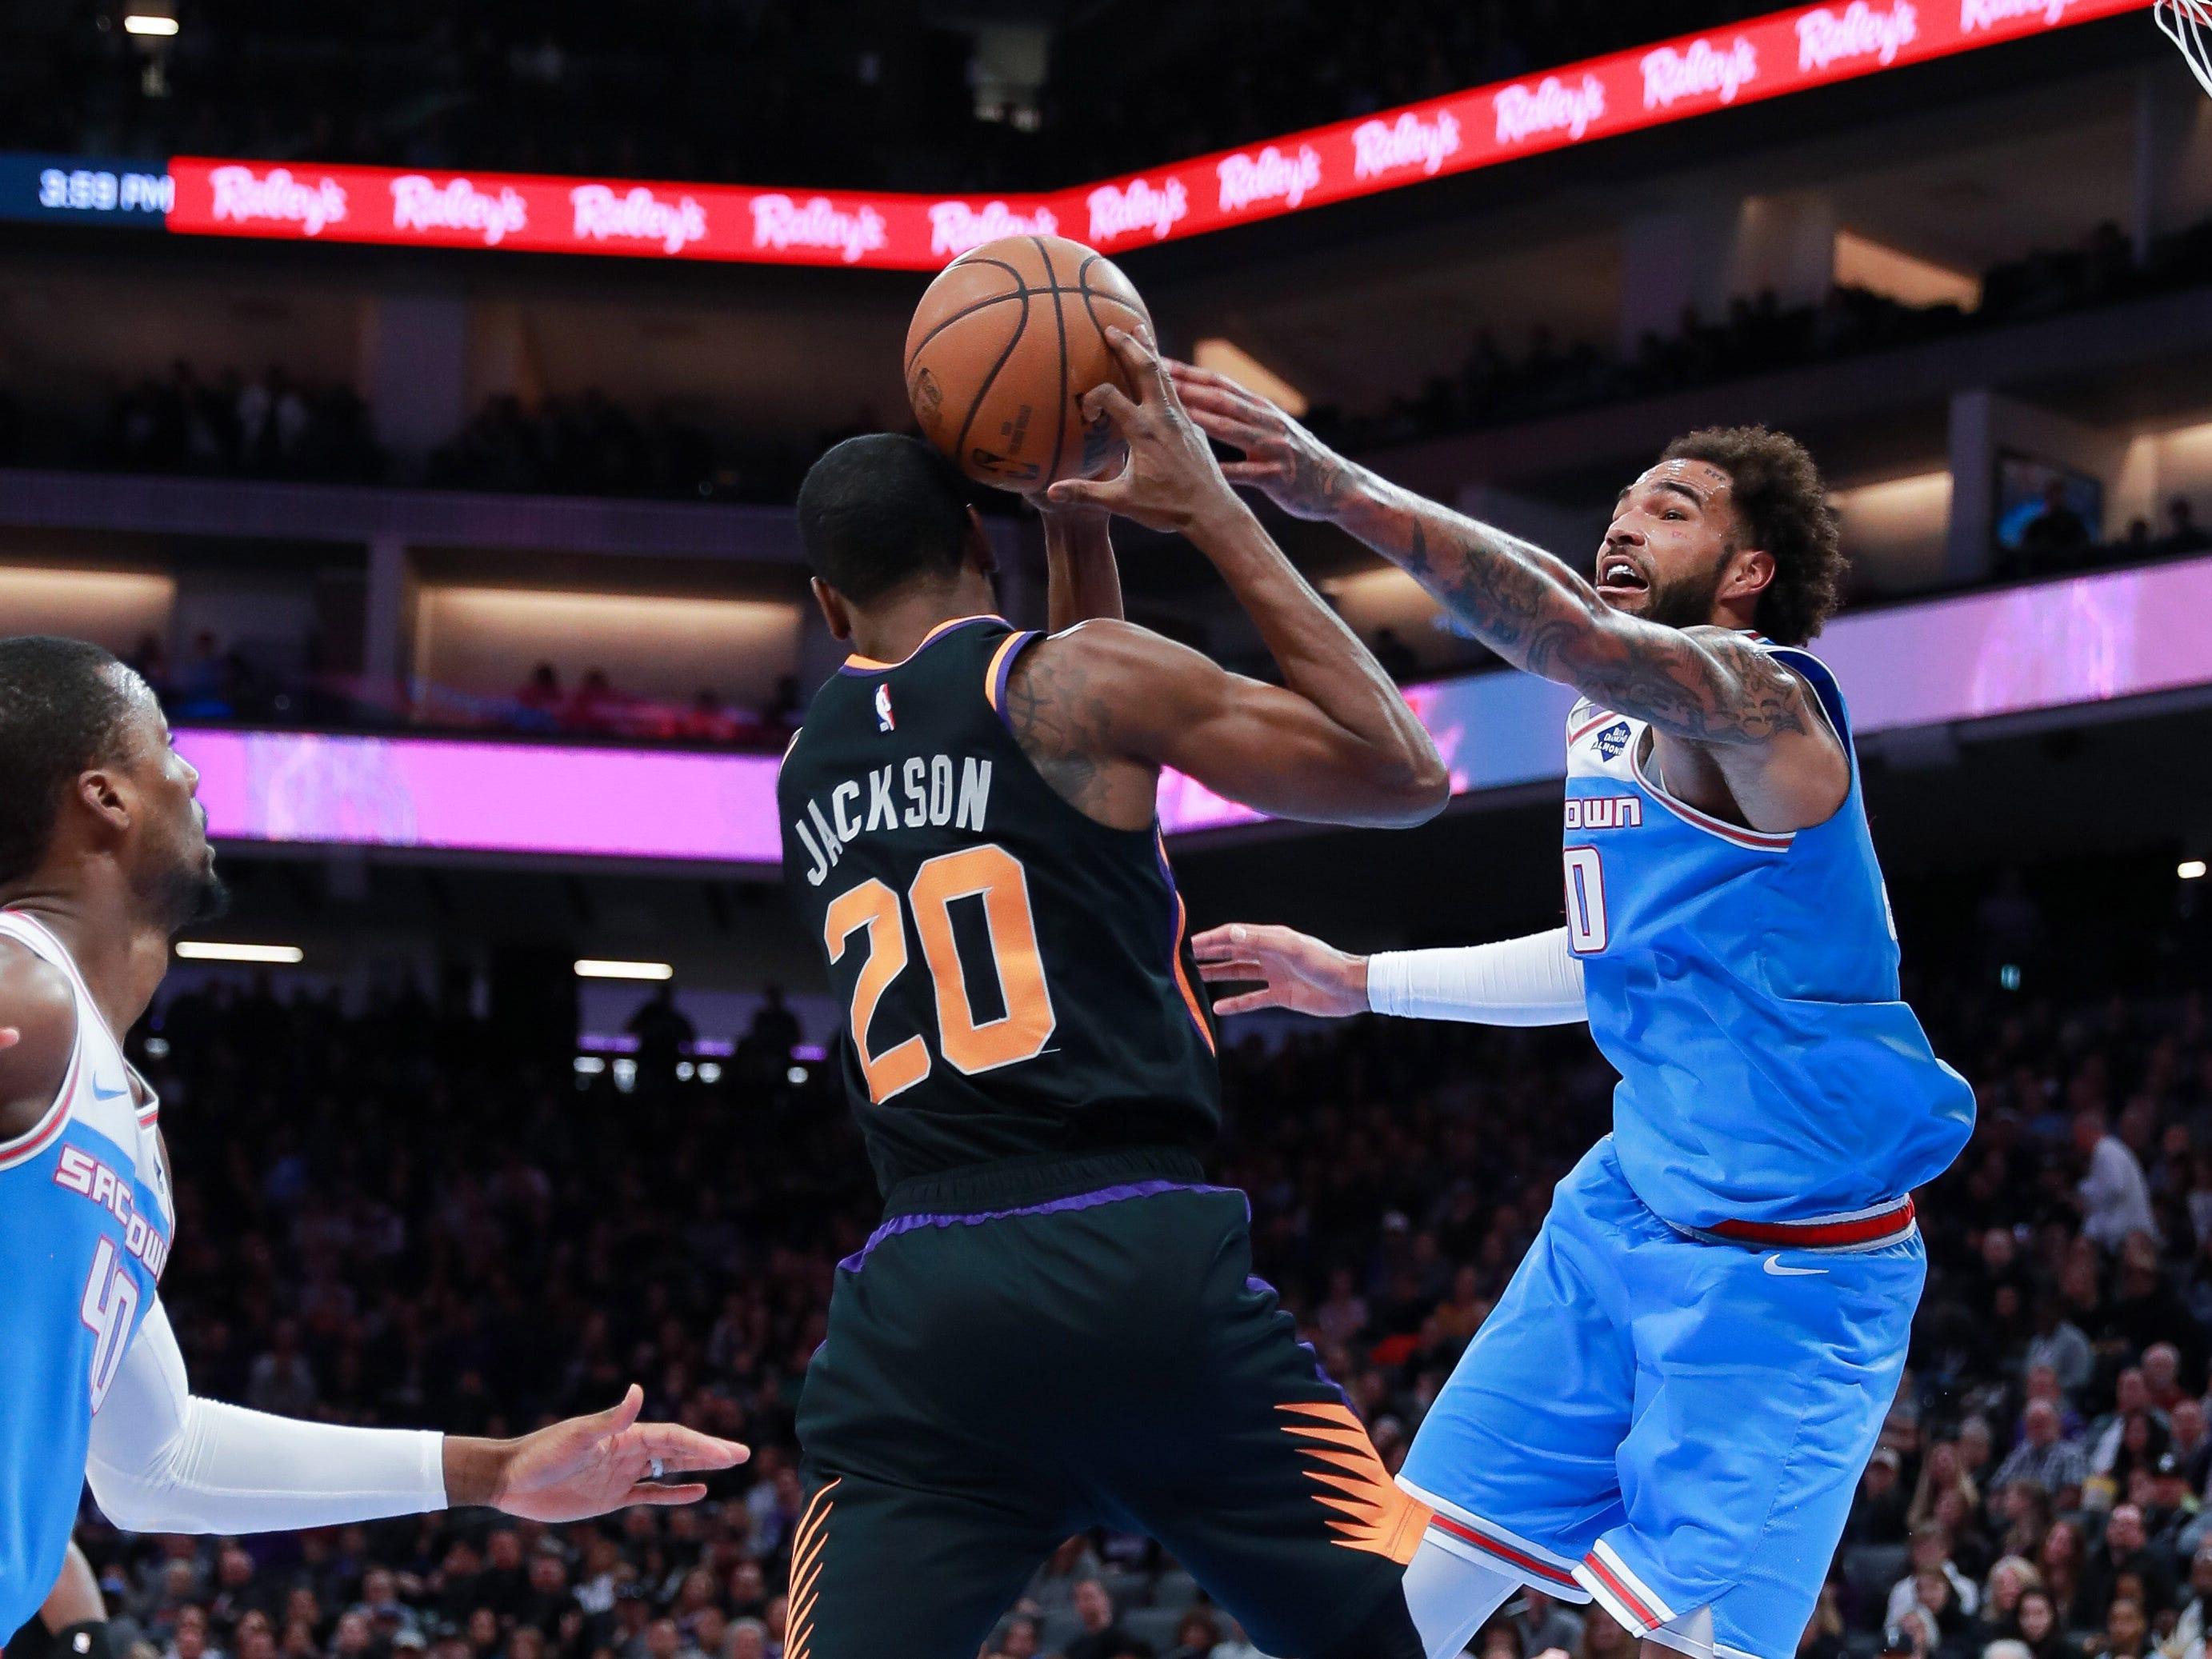 Feb 10, 2019; Sacramento, CA, USA; Sacramento Kings center Willie Cauley-Stein (00) battles for a rebound with Phoenix Suns forward Josh Jackson (20) during the second quarter at Golden 1 Center.